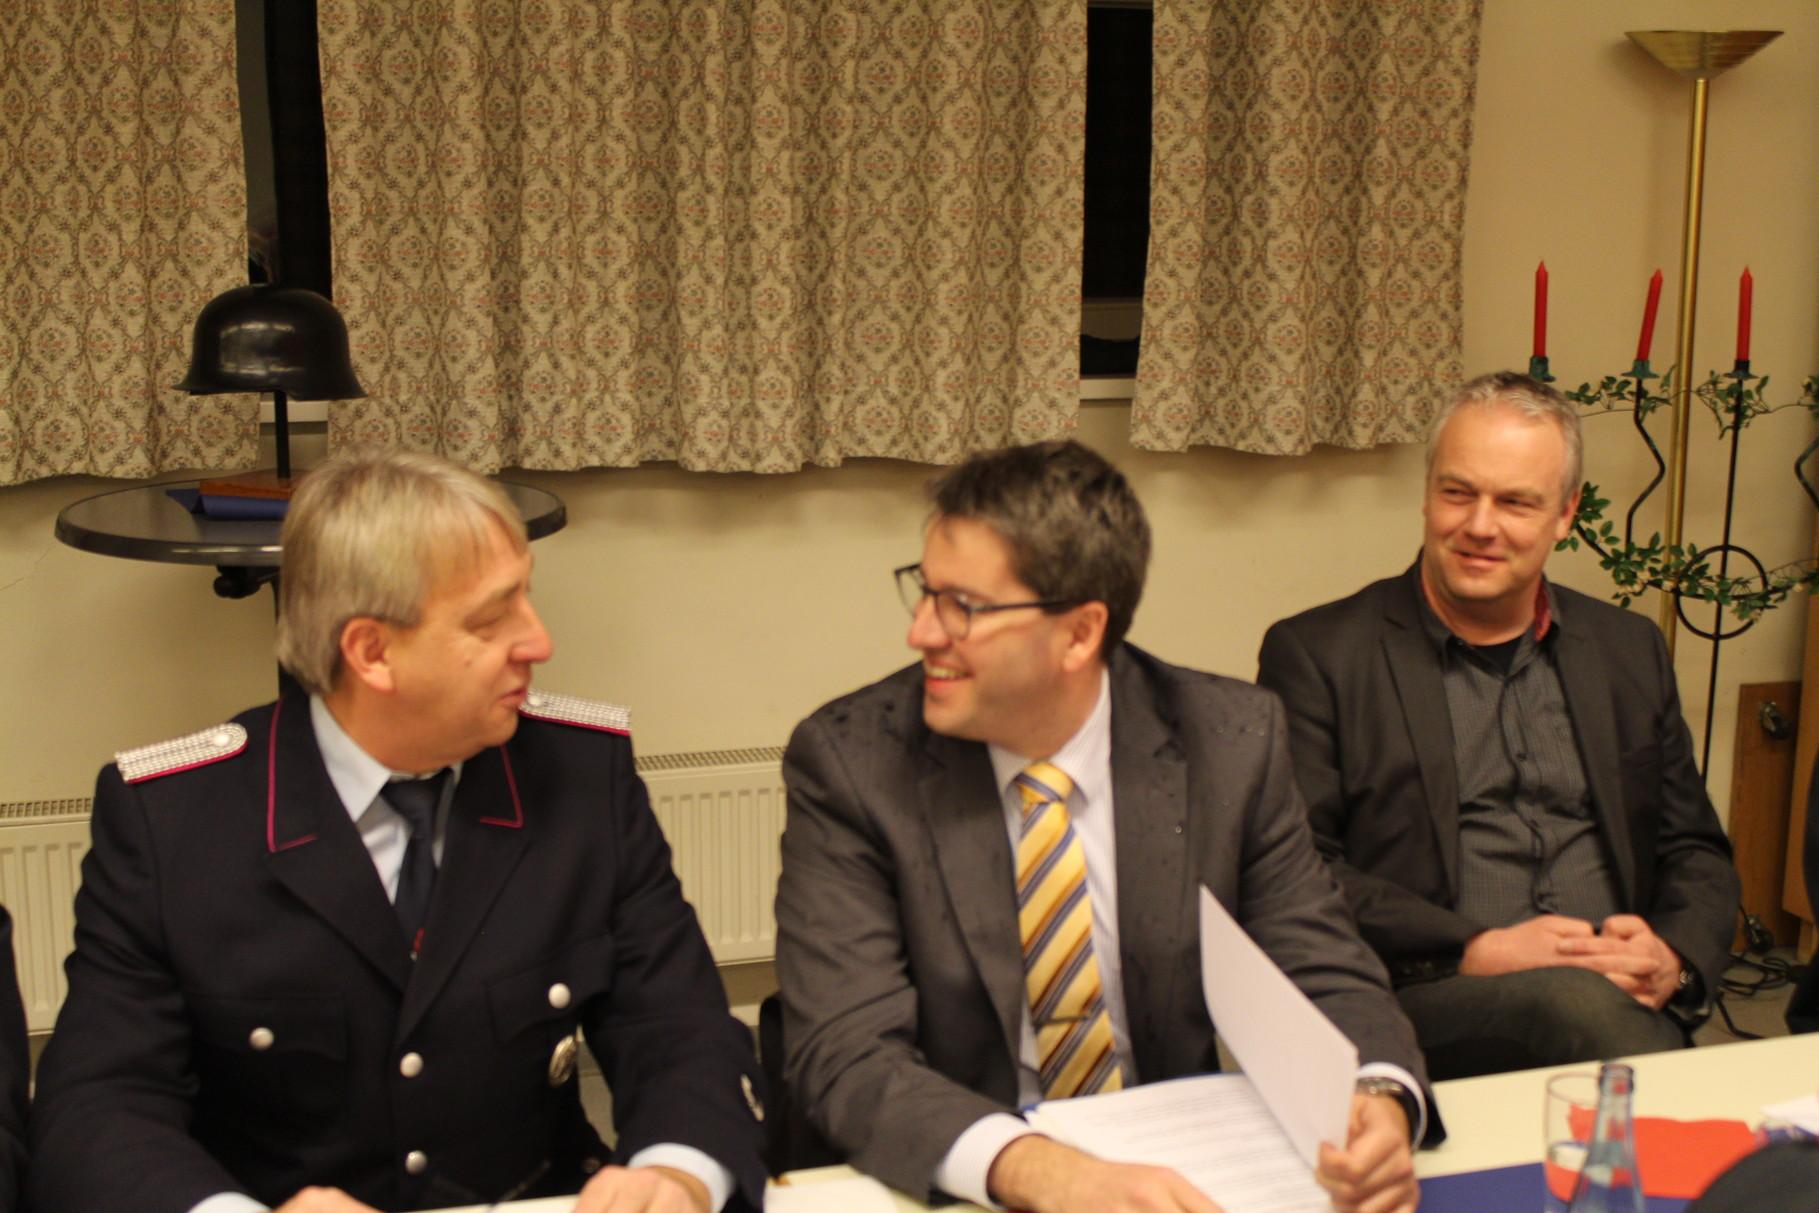 v.l. OBM R.Becker , Oberbürgermeister von Goslar  Herr Dr. Oliver Junk , Stadt GS Fachreferat O. & S. Herr T. Meißner